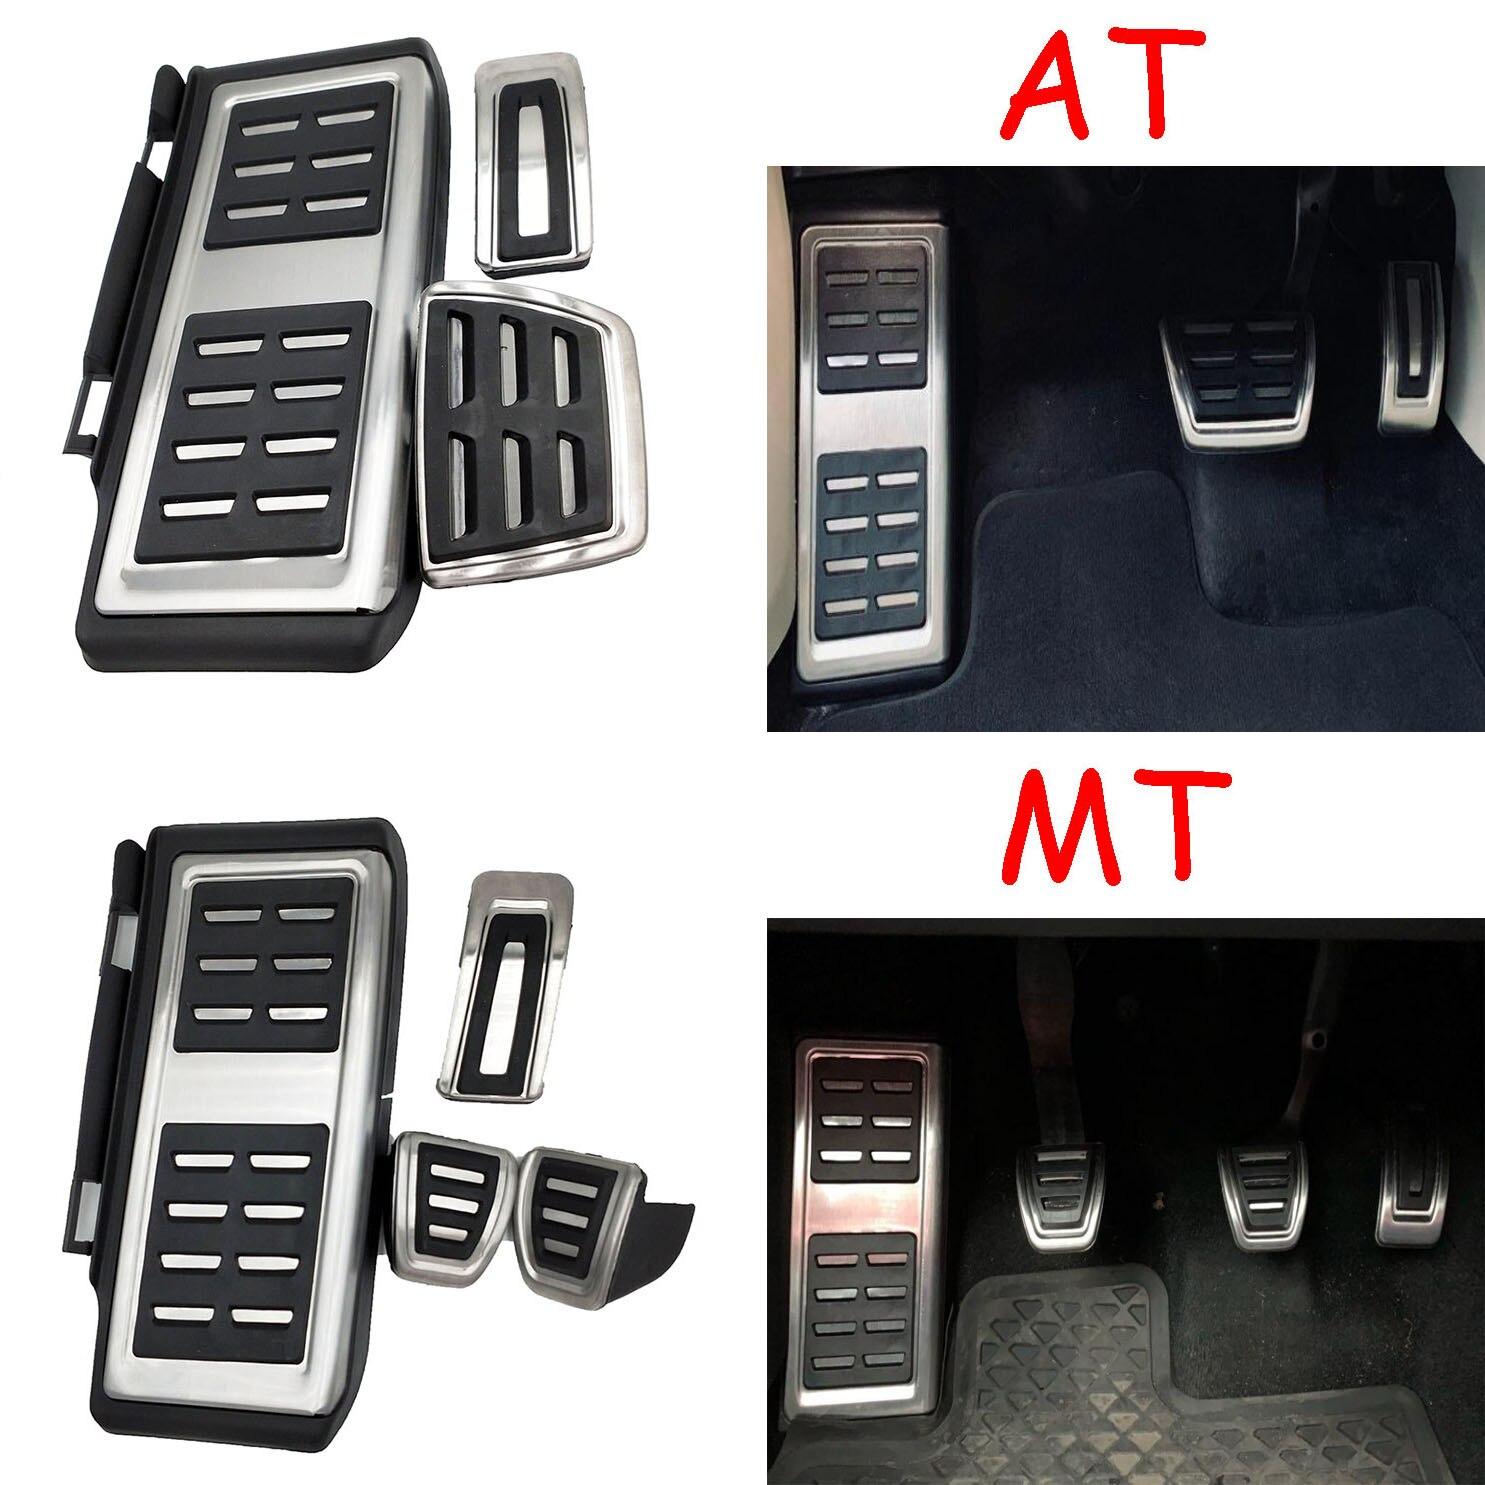 HOT Car Accessories Stainless Steel Pedal For VW GOLF 7 GTi MK7 Lamando POLO A05 Passat B8 Skoda Rapid Octavia 5E 5F A7 2014+